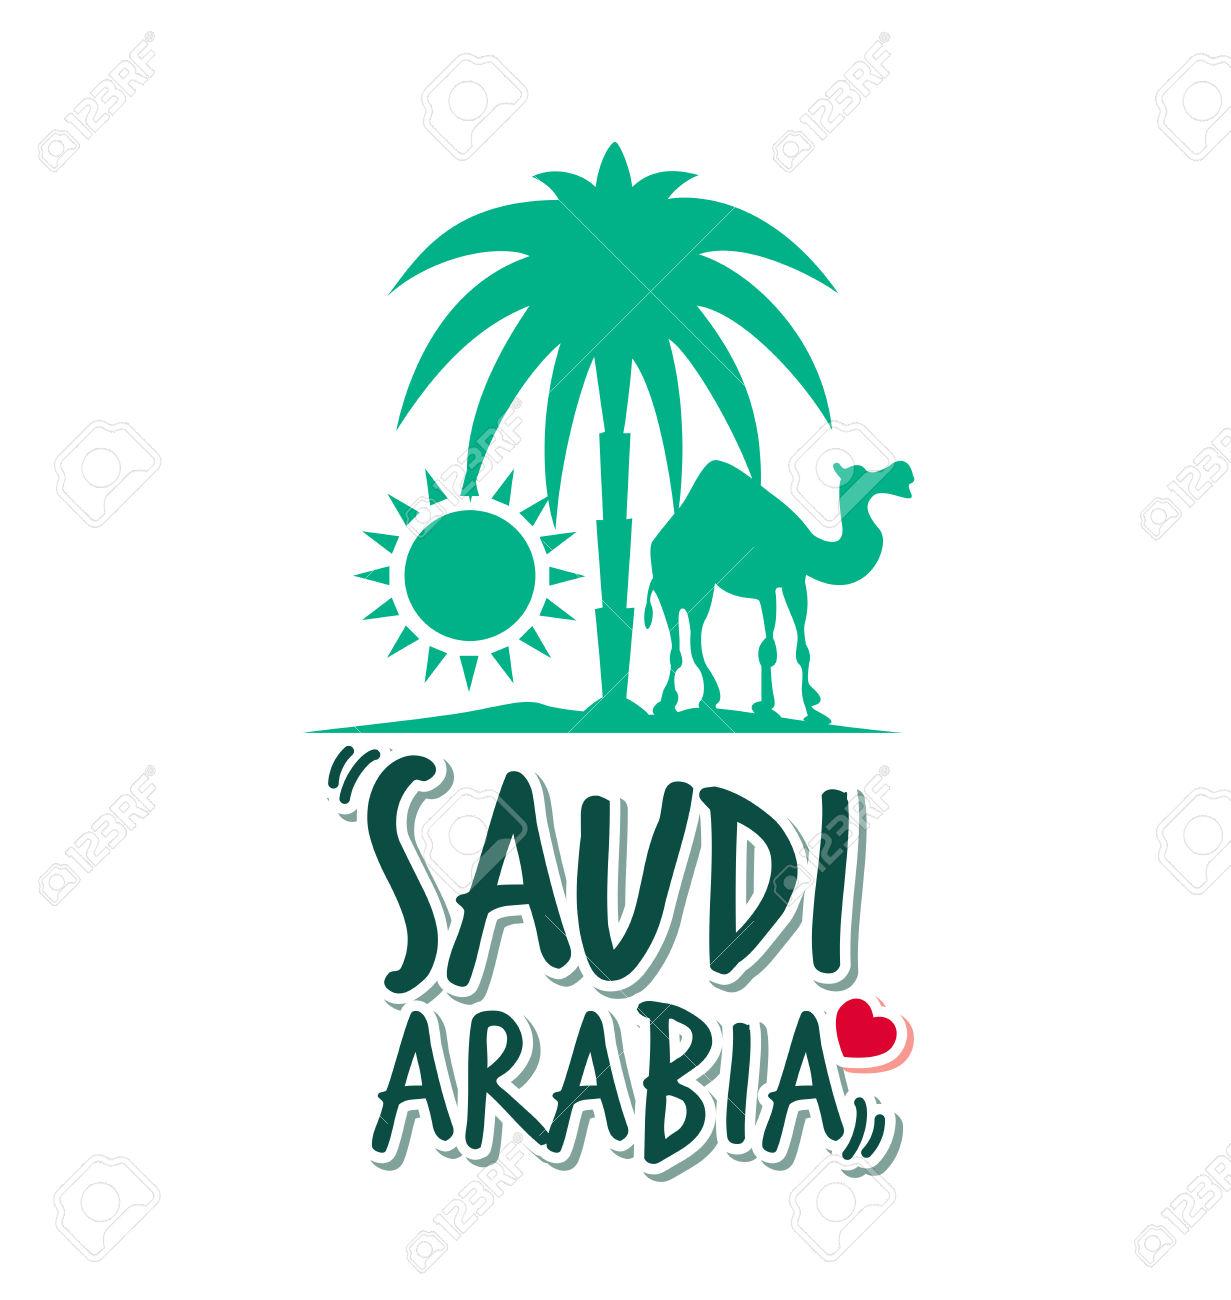 Saudi arabia clipart.